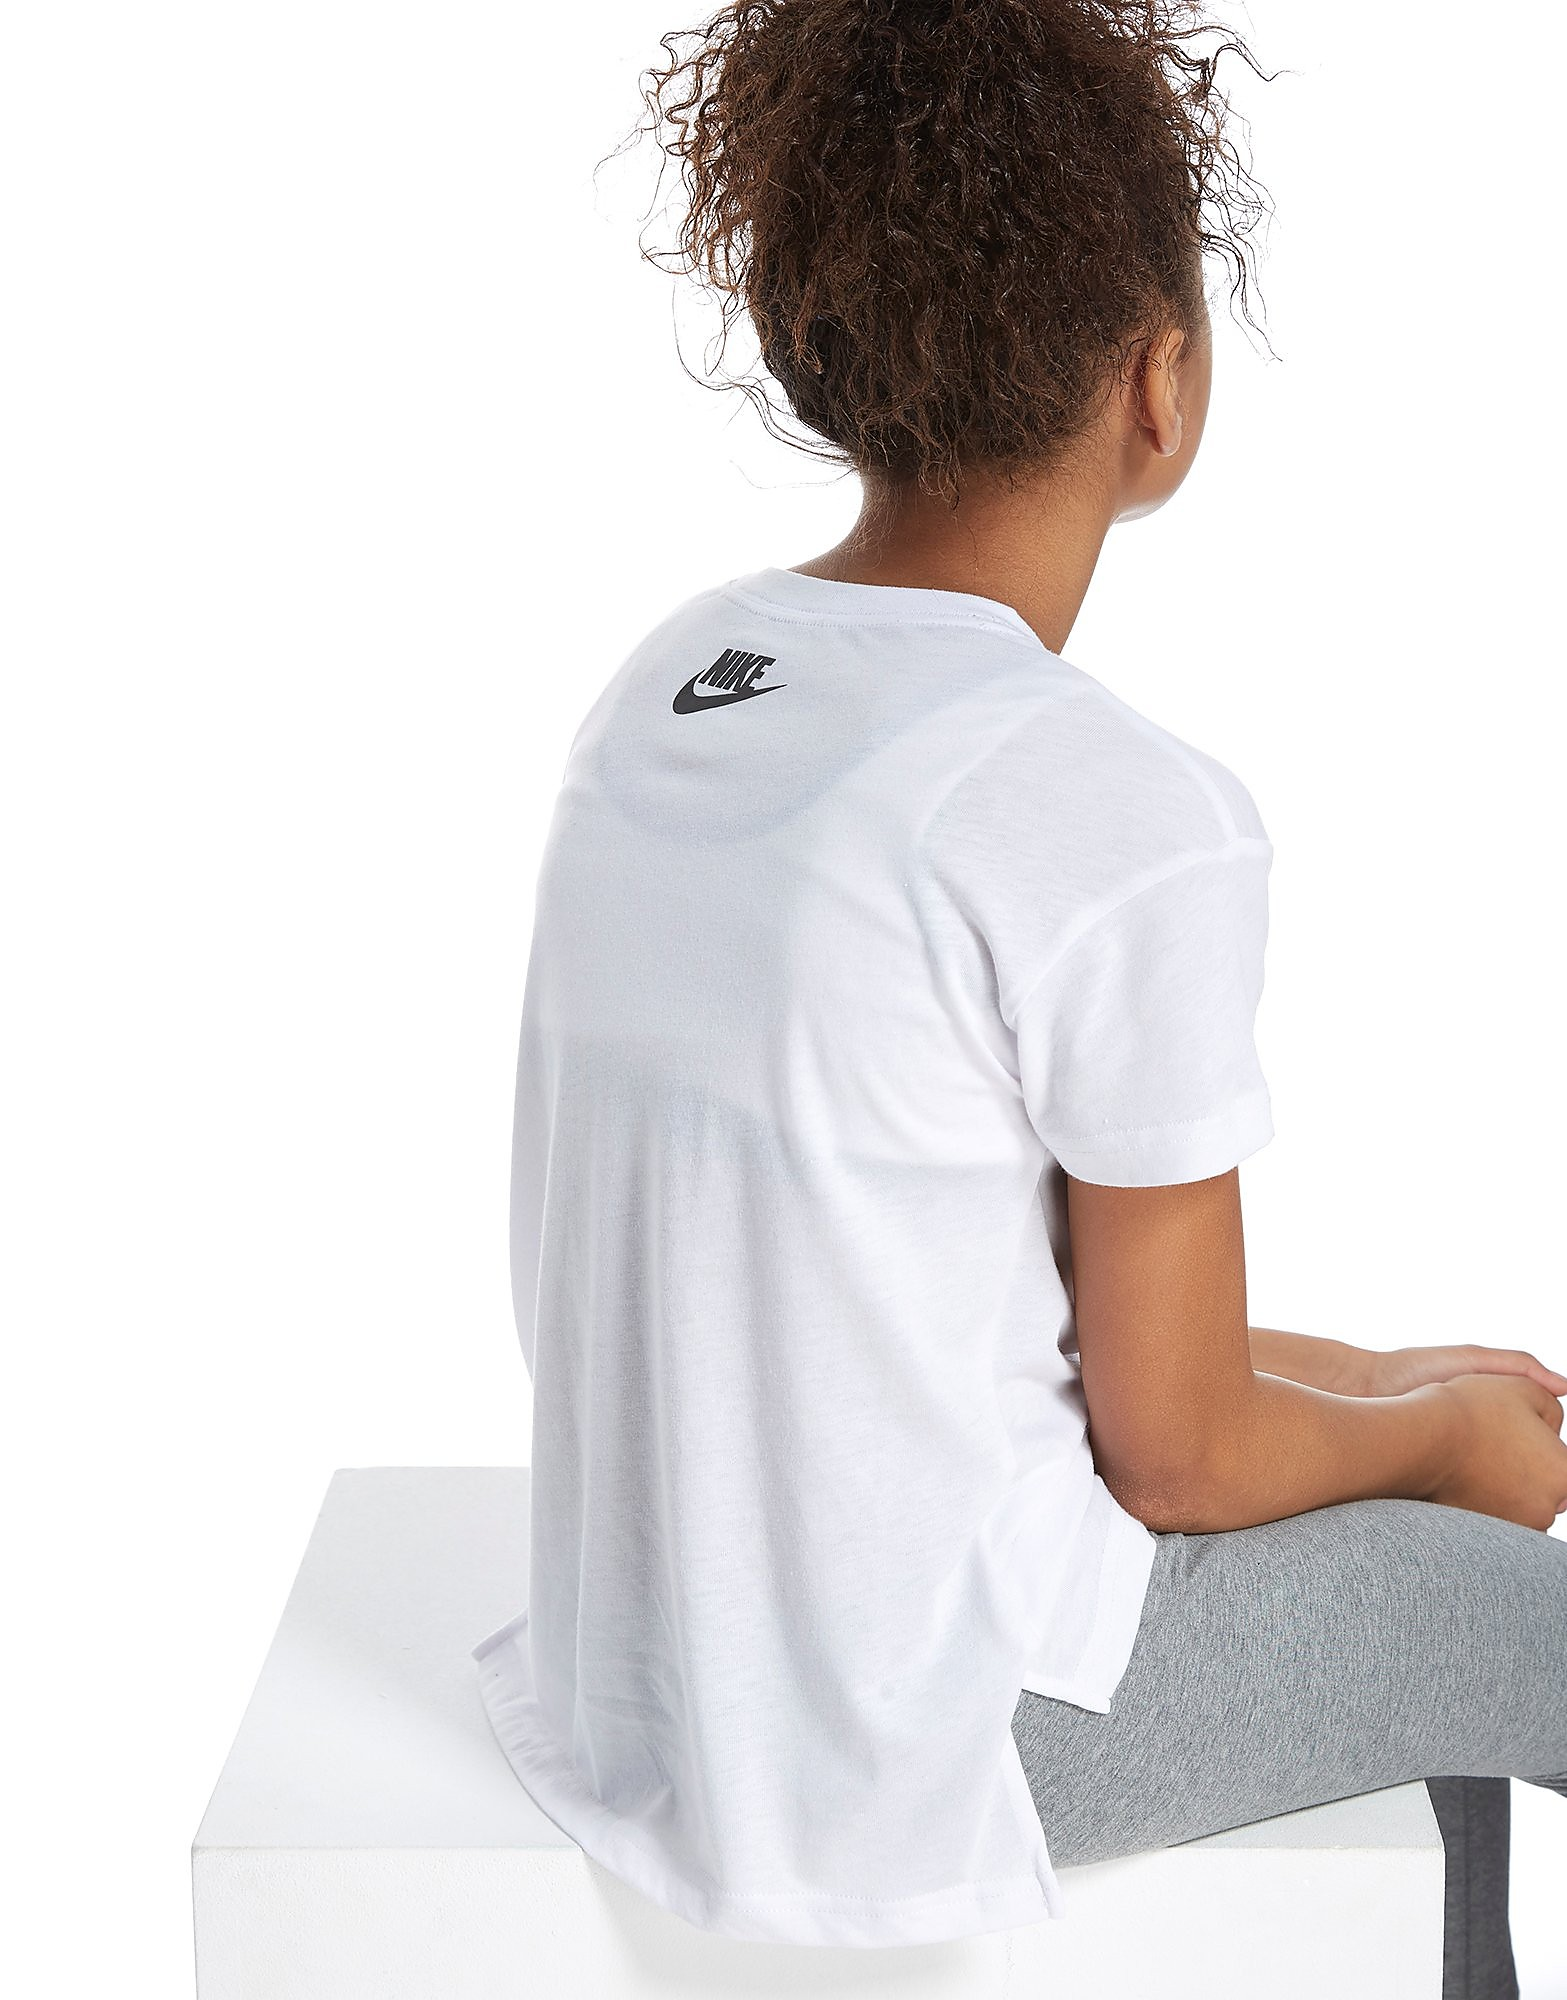 Nike Girls' Just Do It Cropped T-Shirt Junior